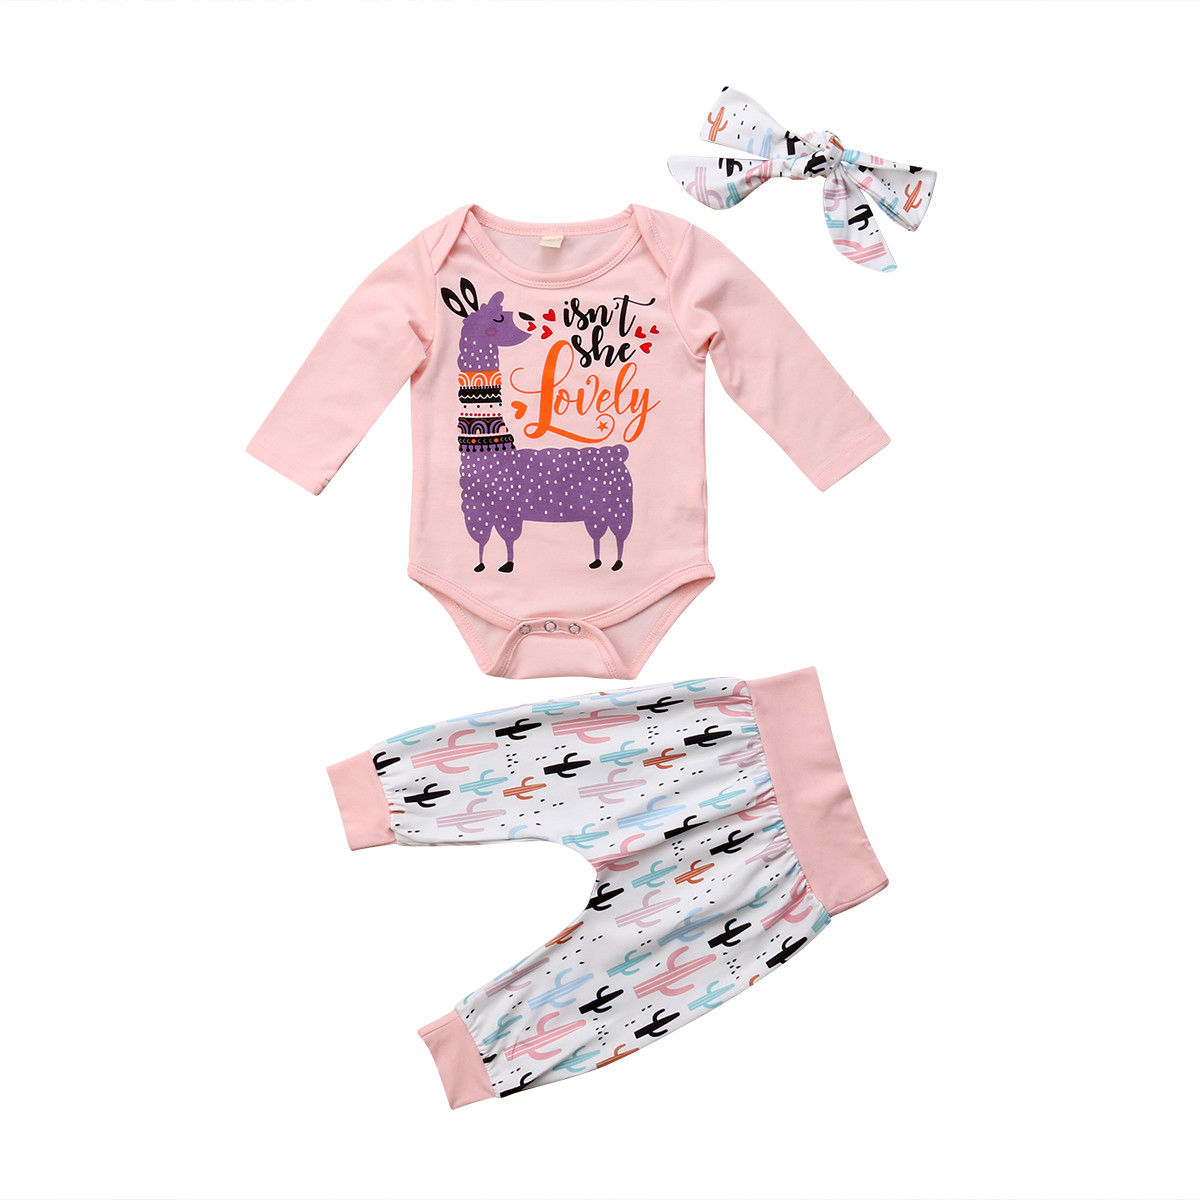 Newborn Baby Girls Cotton Clothes Autumn Romper+Floral Pants Long Outfit Set US